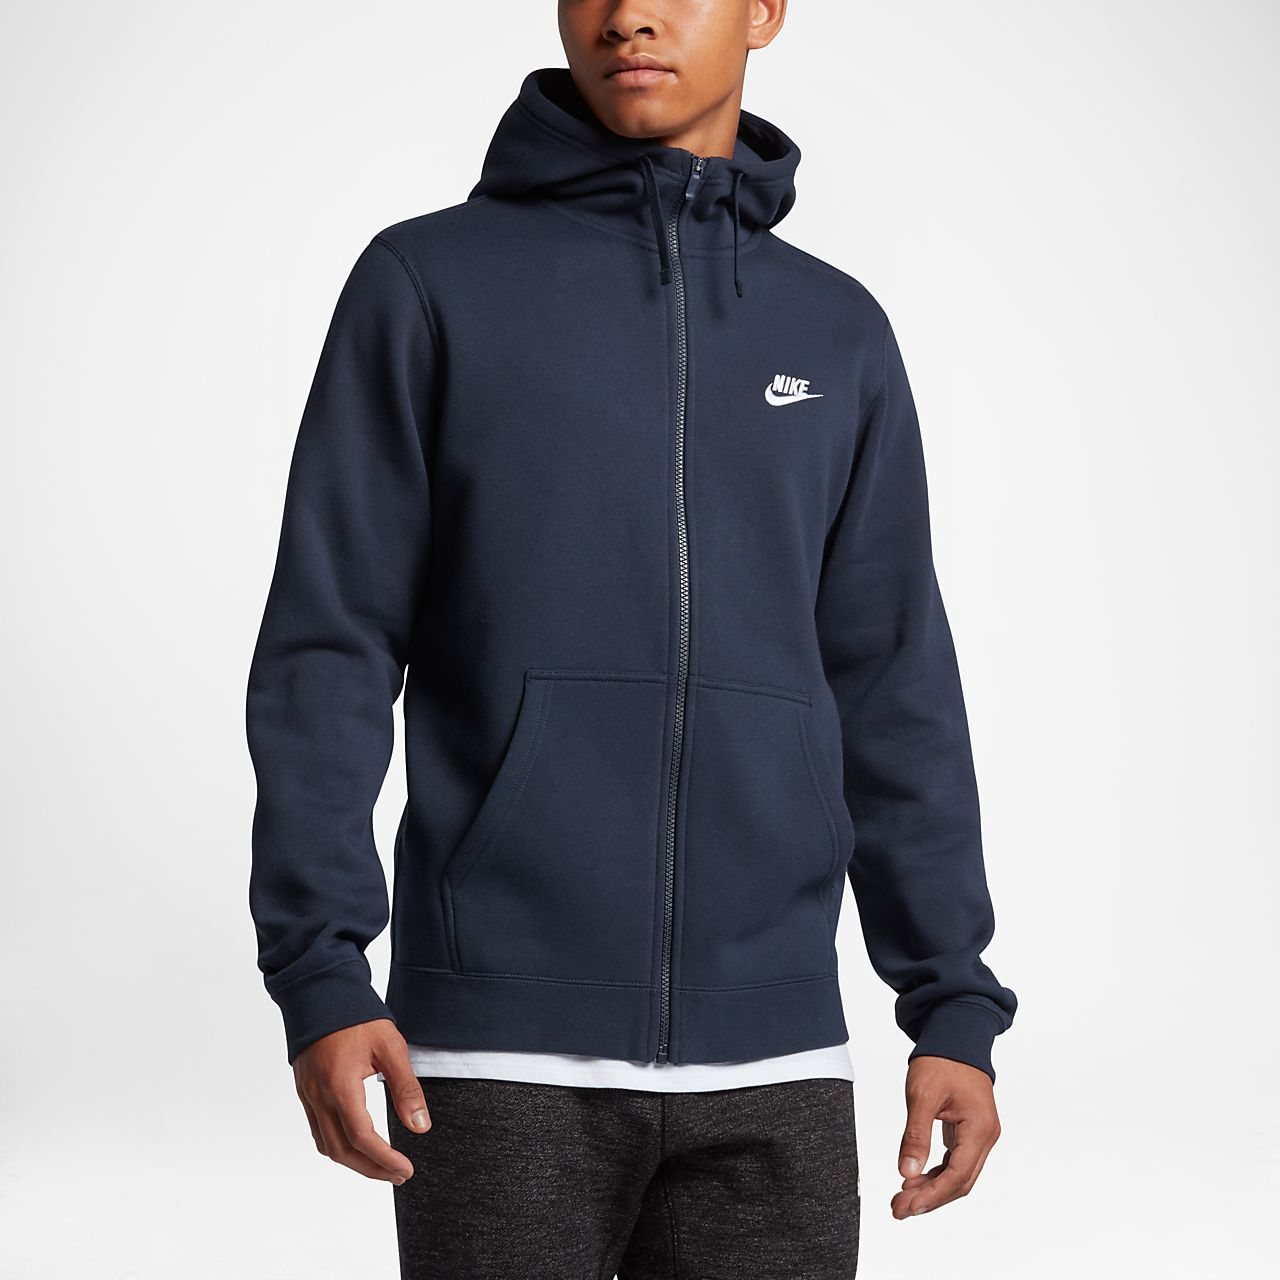 522349ff4bc Nike Sportswear Club Fleece Men's Hoodie. Nike.com